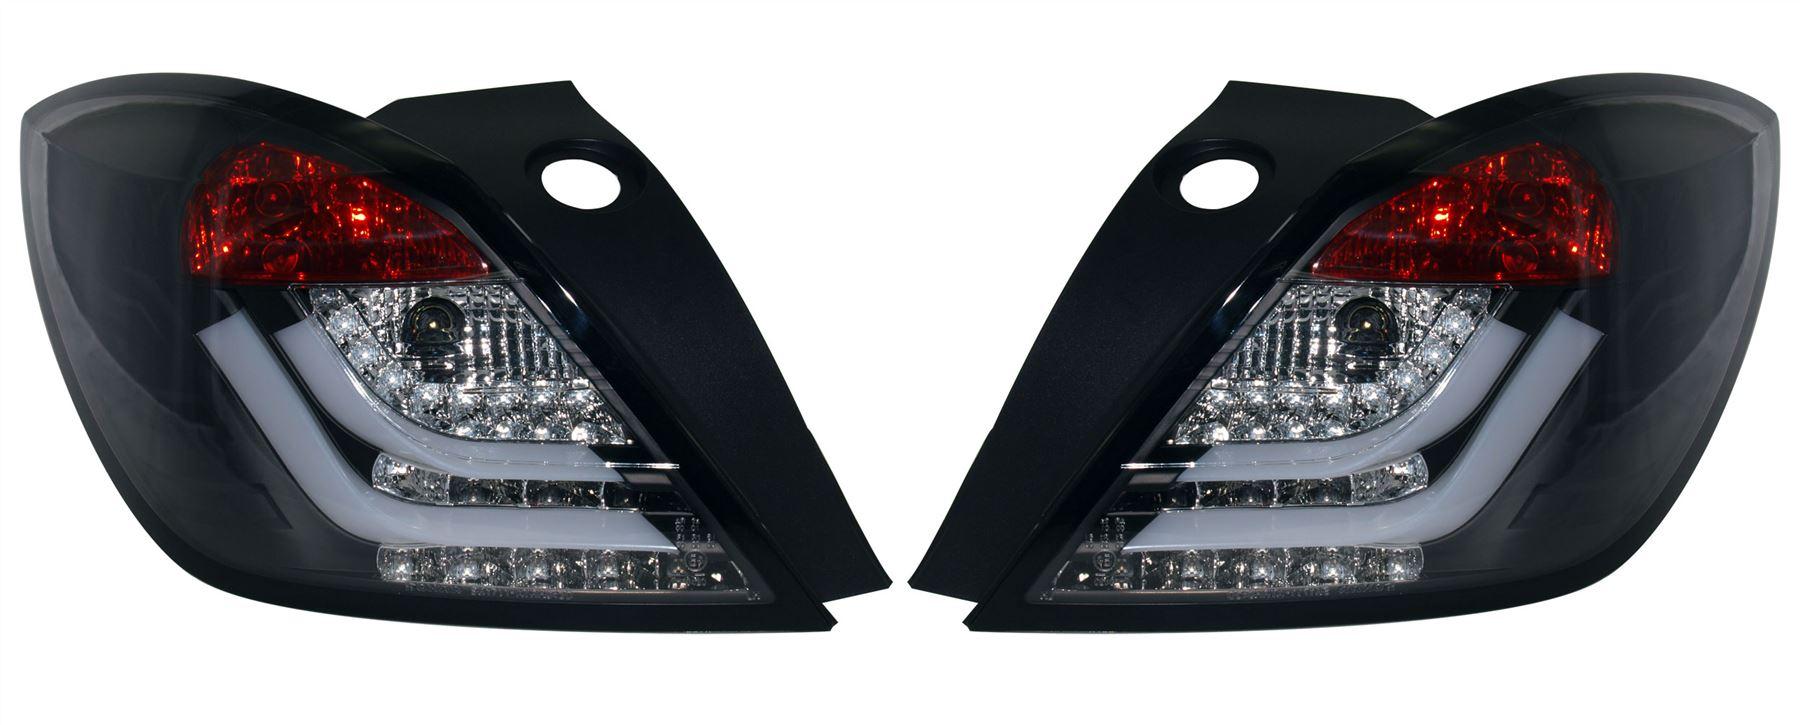 Image is loading Vauxhall-ASTRA-H-MK5-3-DOOR-CRYSTAL-BLACK-  sc 1 st  eBay & Vauxhall ASTRA H MK5 3 DOOR CRYSTAL BLACK LED REAR BACK TAIL LIGHTS ...